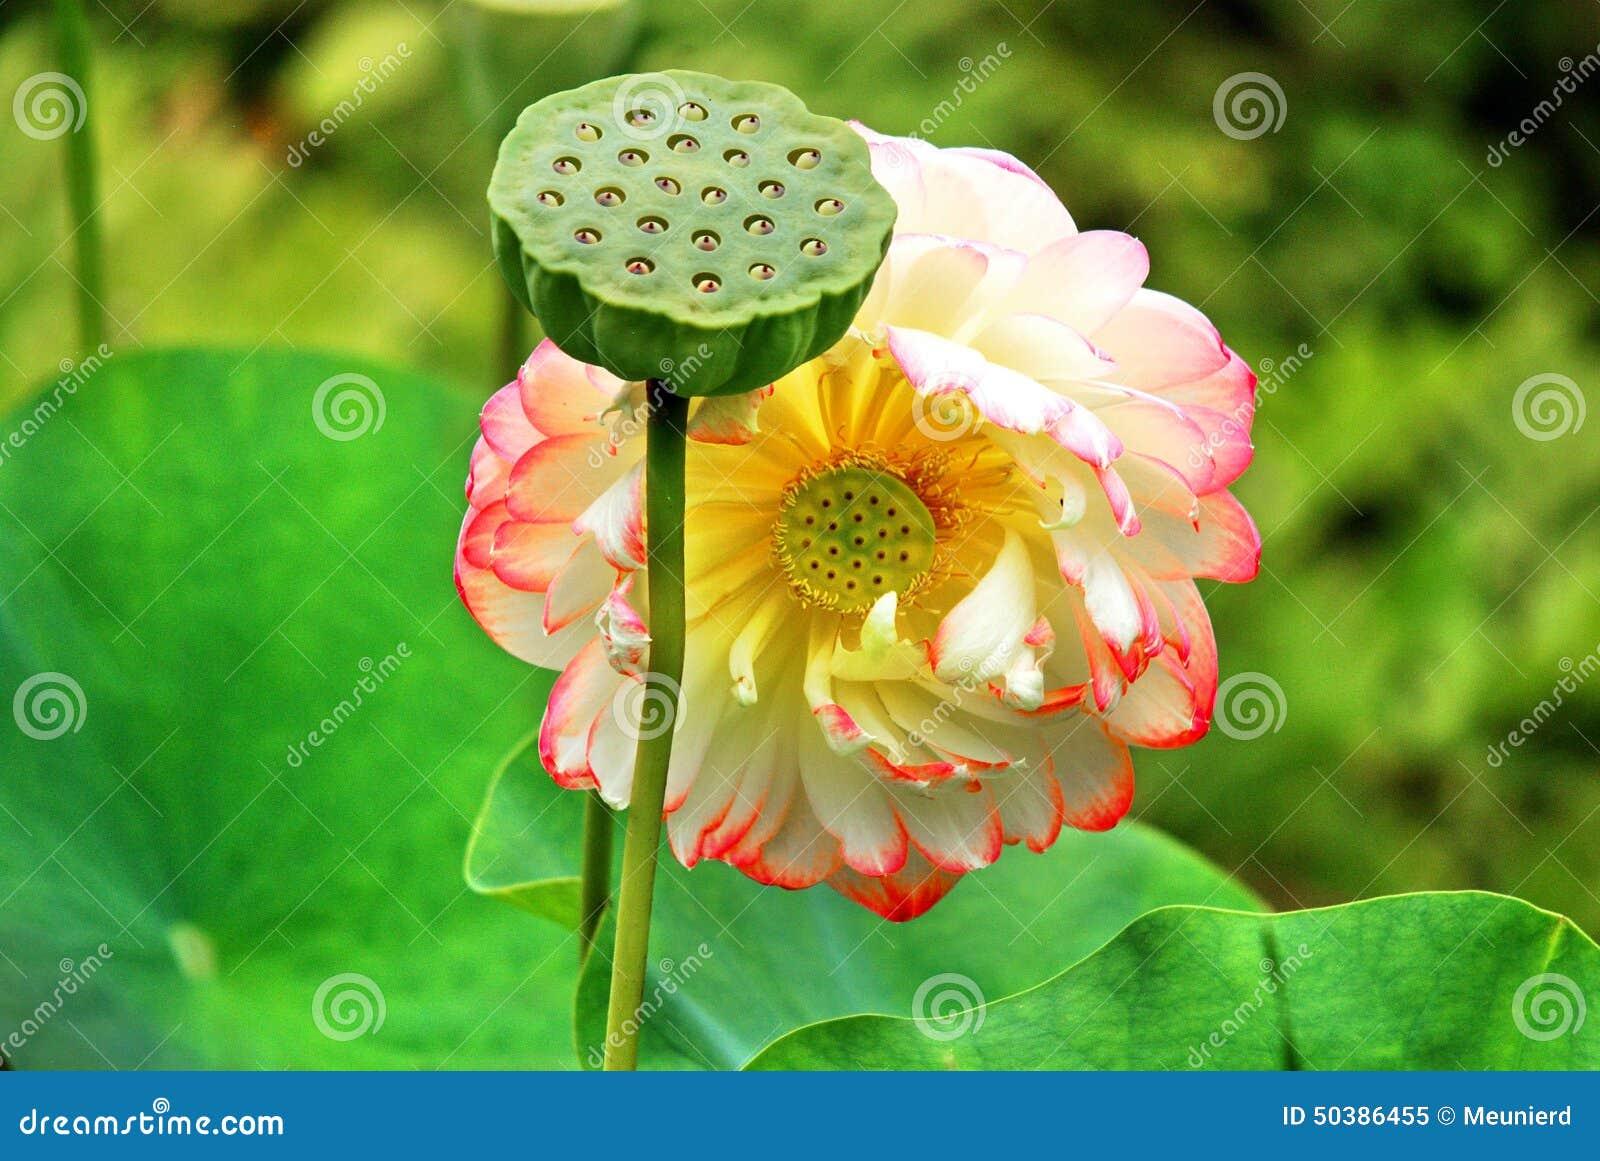 Lotus Flower Stock Image Image Of Garden Bright Blossom 50386455